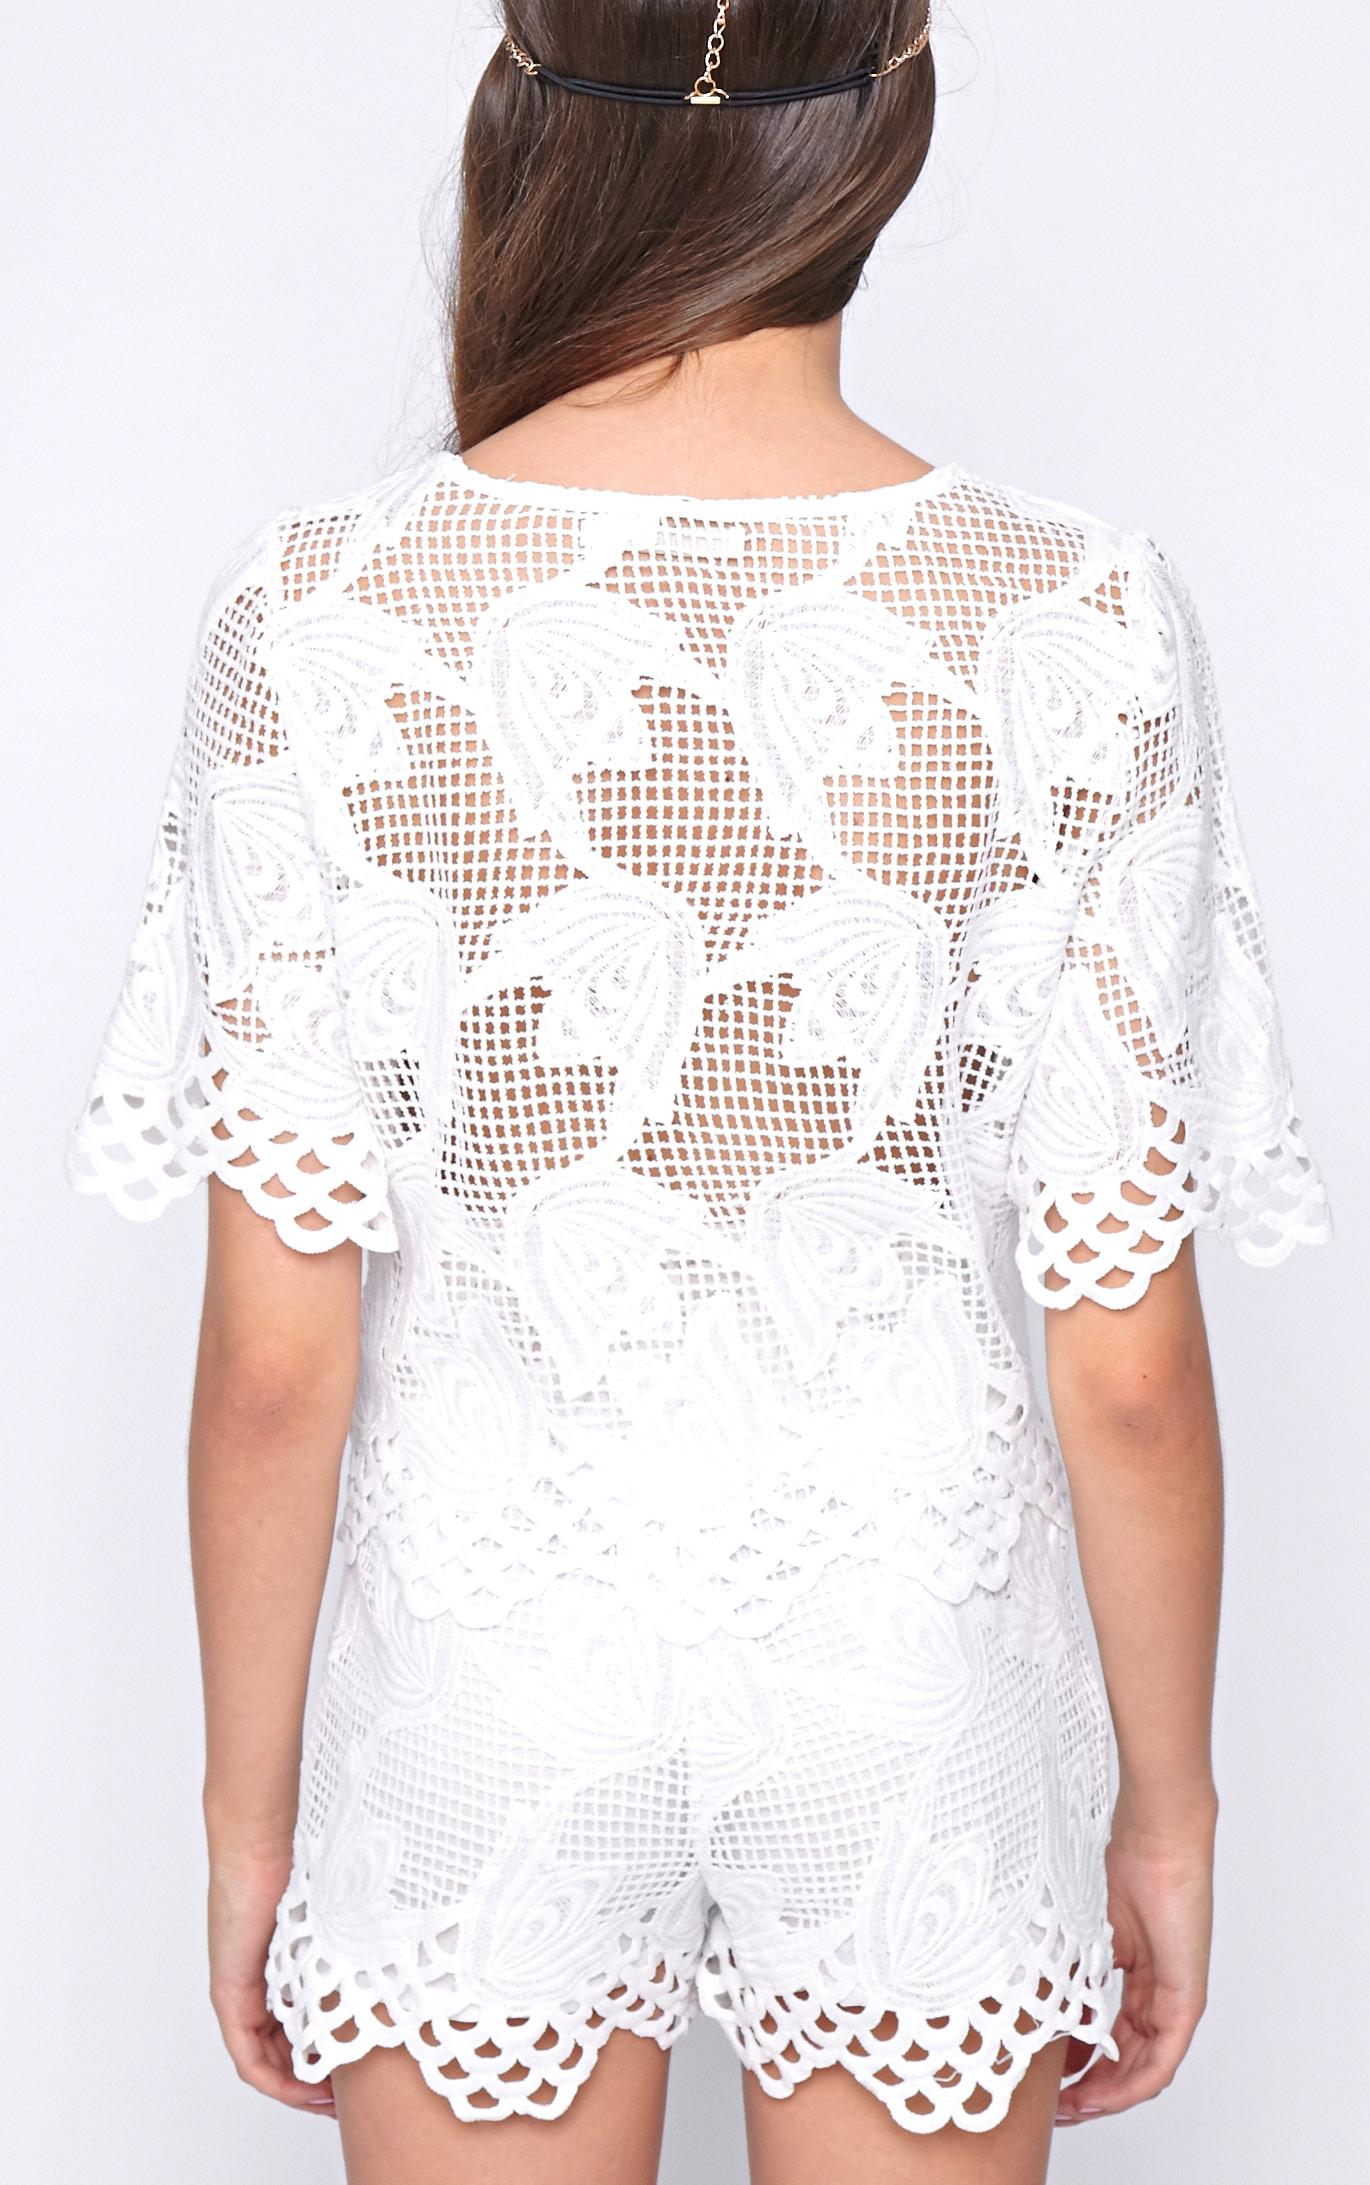 Fern White Crochet Boxy Crop 2